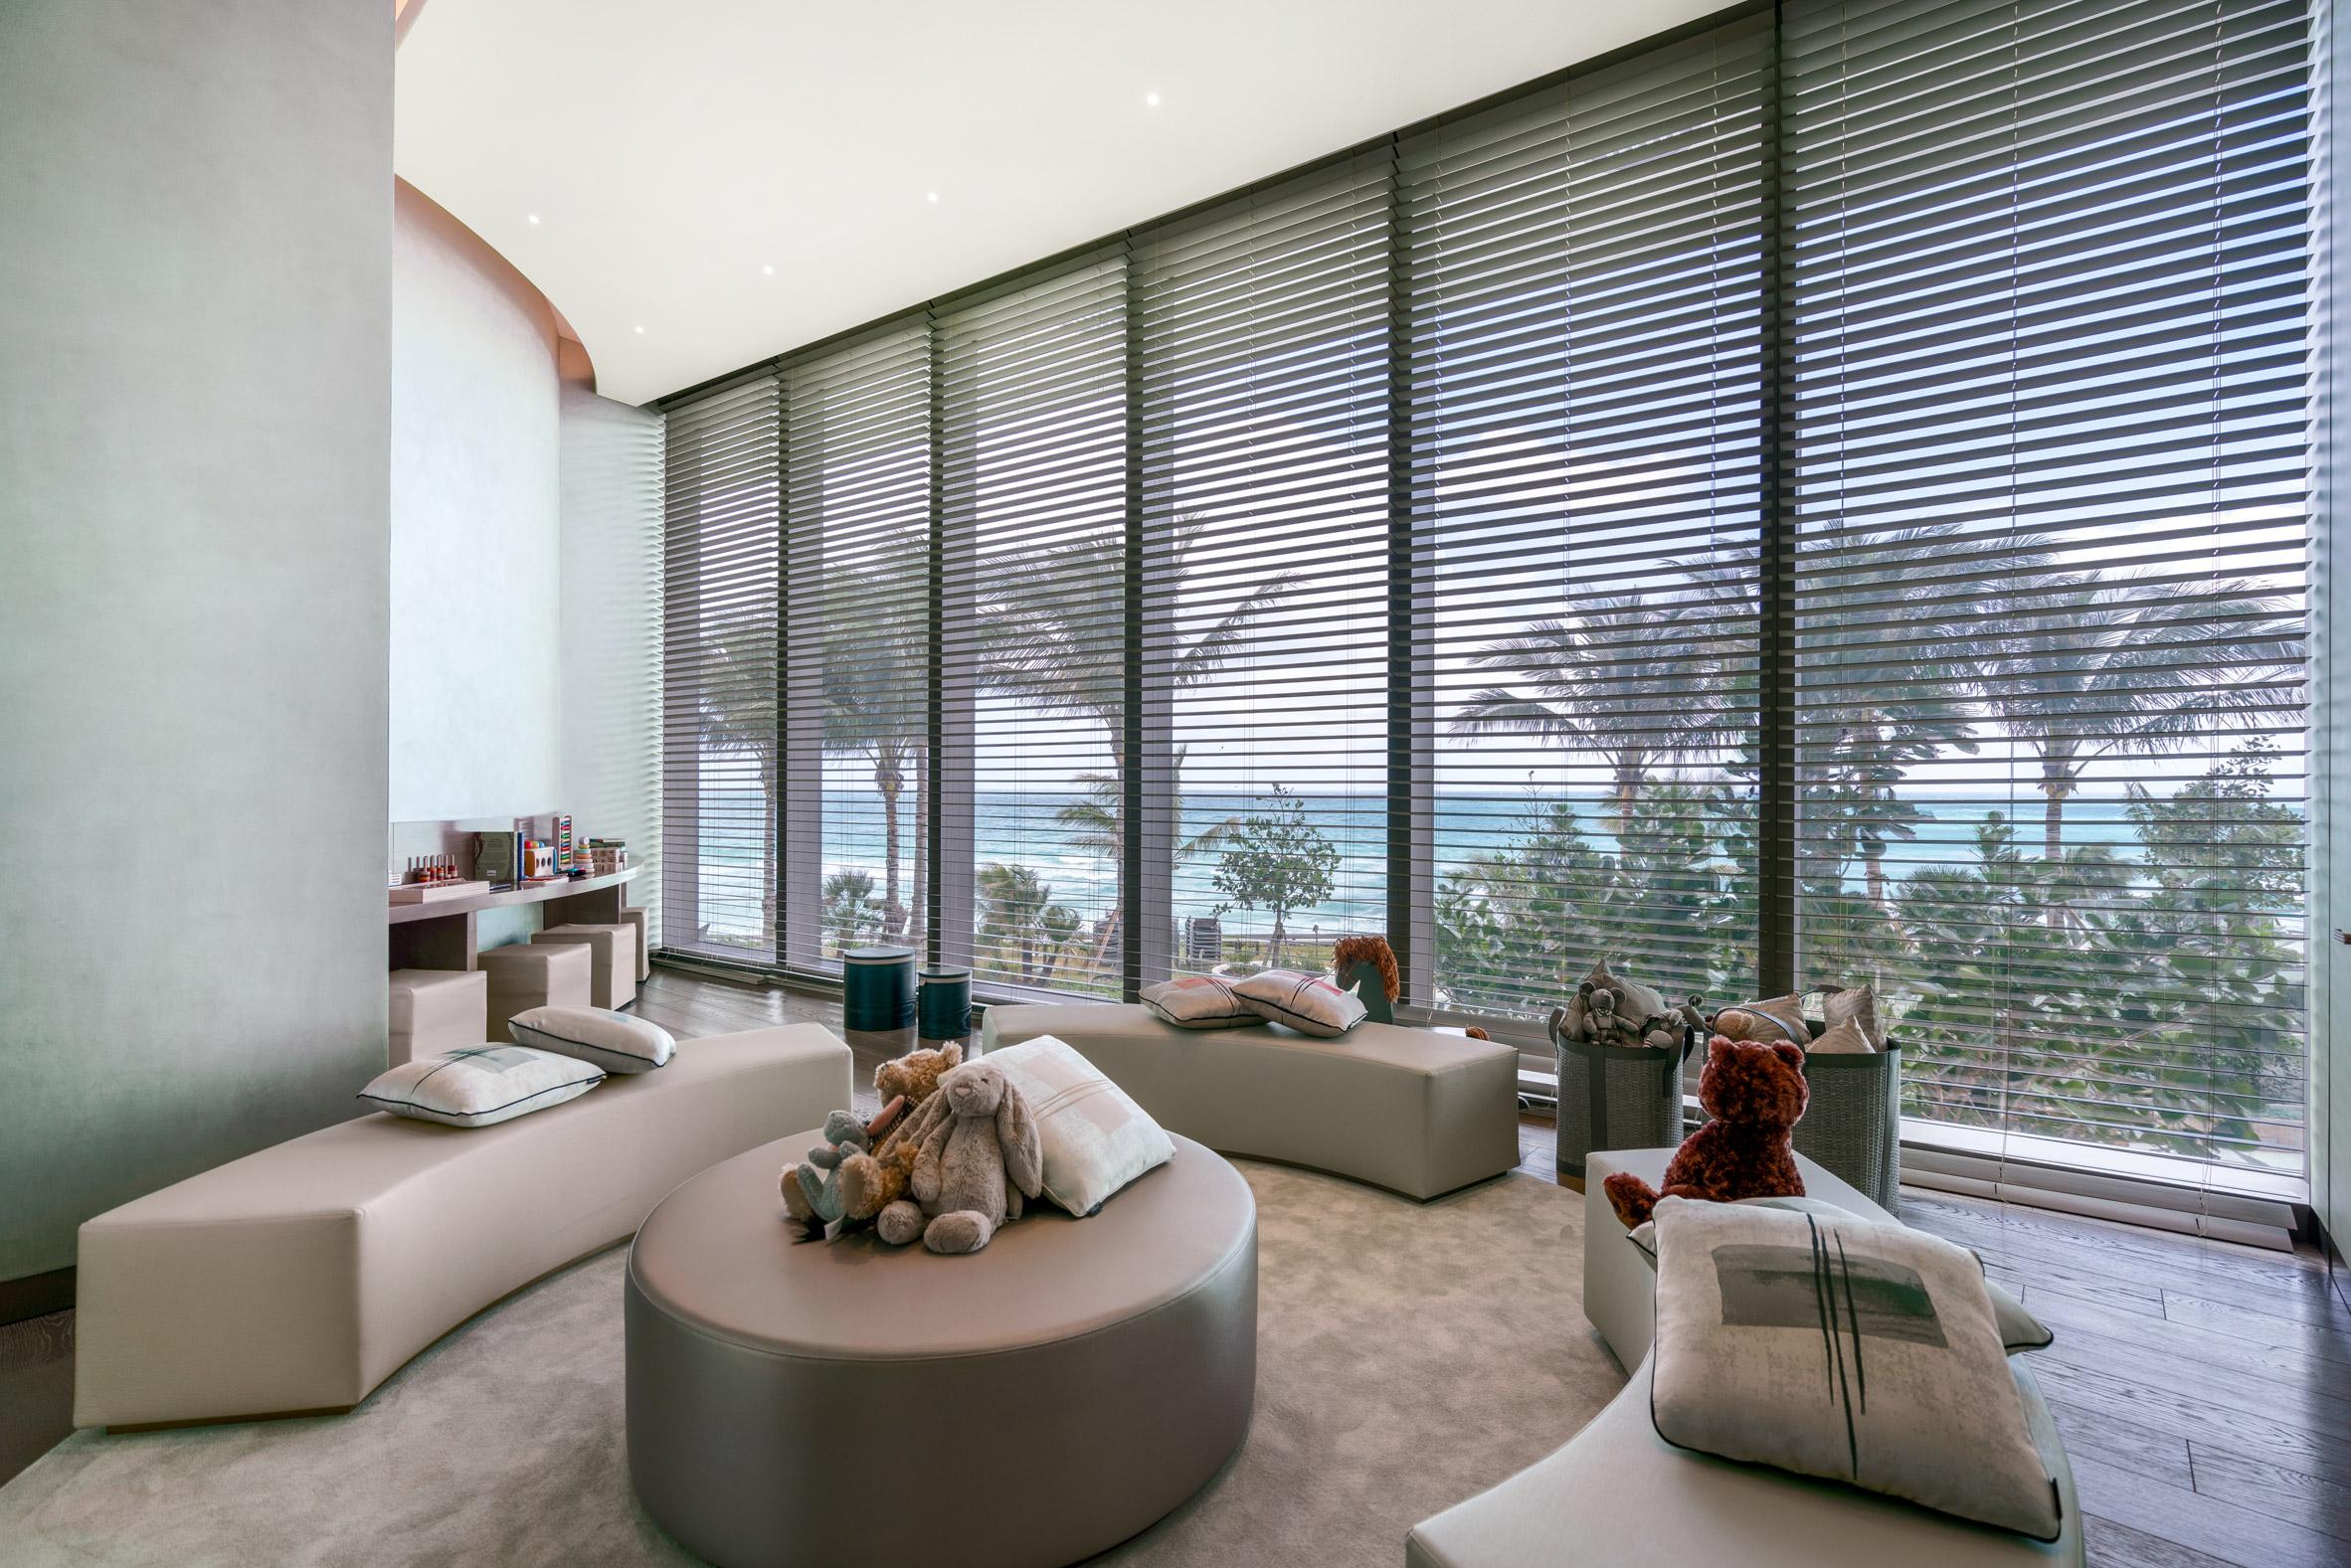 Residences By Armani Casa Has Amenities Designed By Giorgio Armani